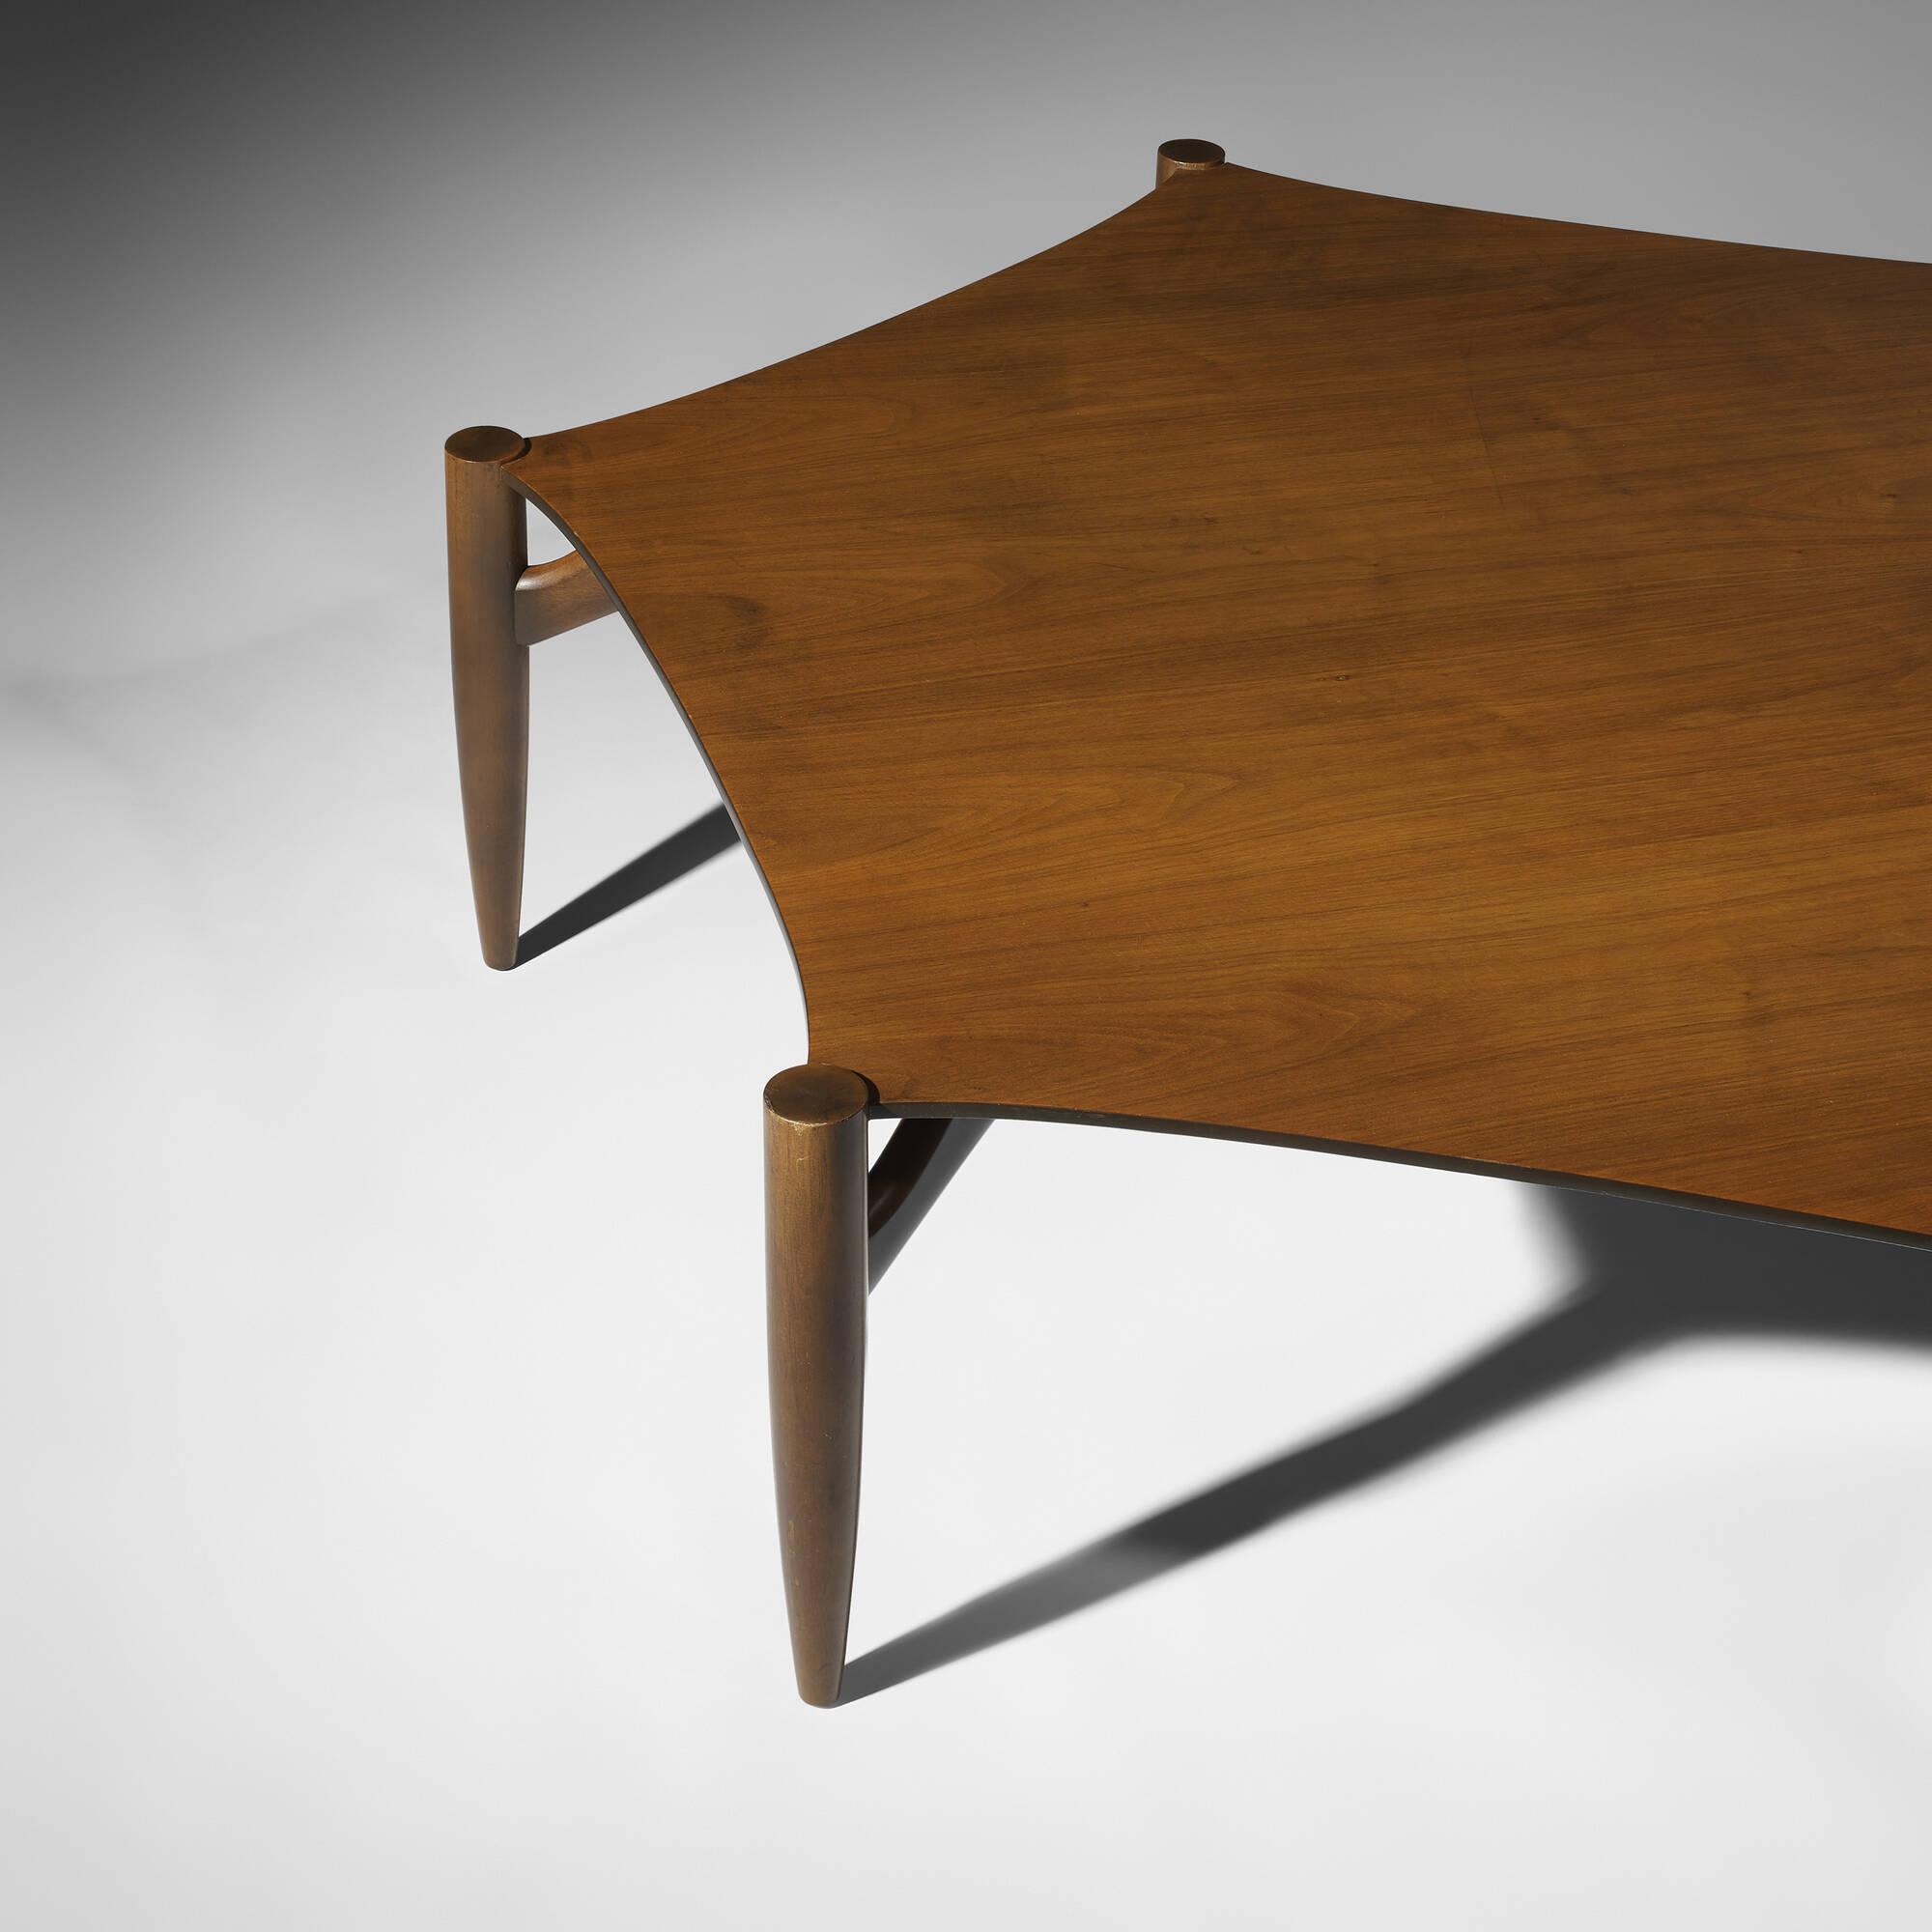 198 greta magnusson grossman rare octagonal coffee table 198 greta magnusson grossman rare octagonal coffee table 2 of 2 geotapseo Gallery